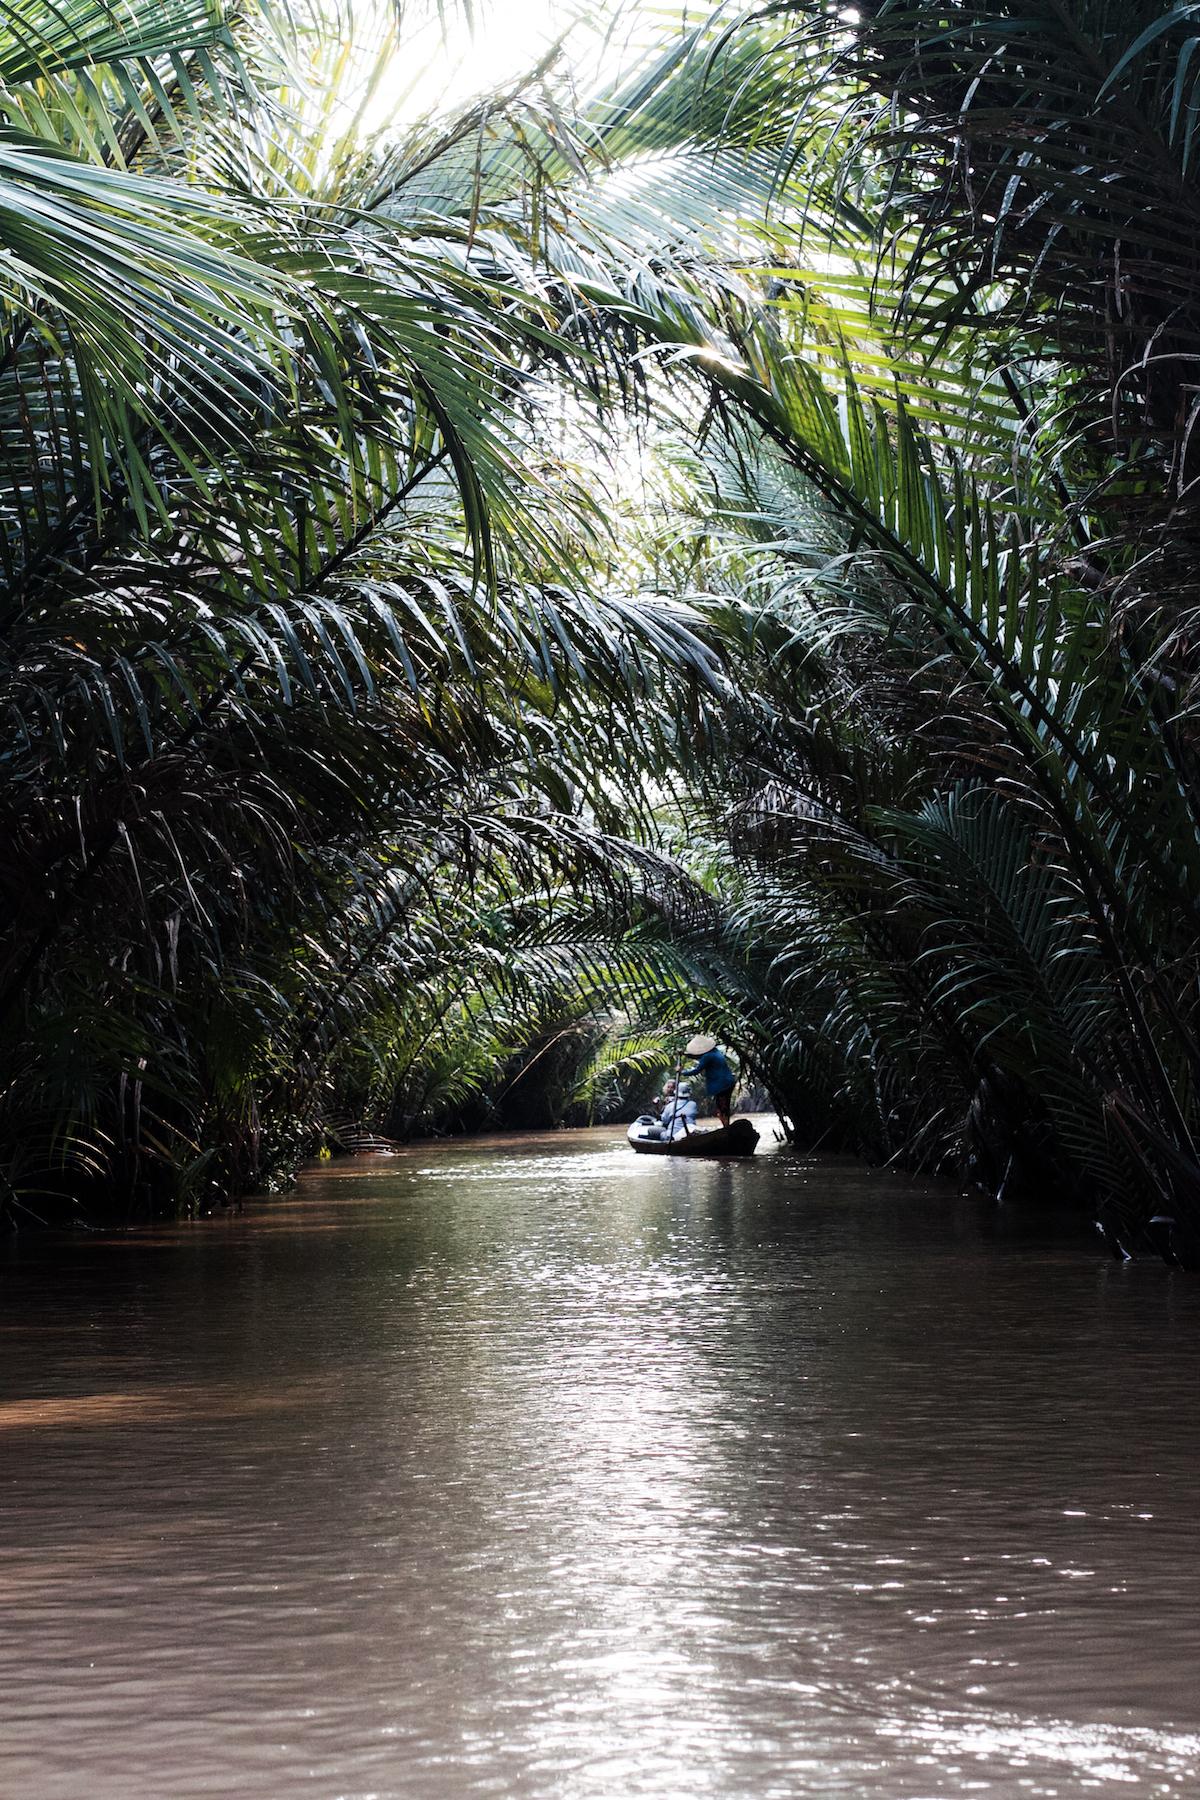 Mekong River Delta, Vietnam Travel Diary | Ruby Josephine